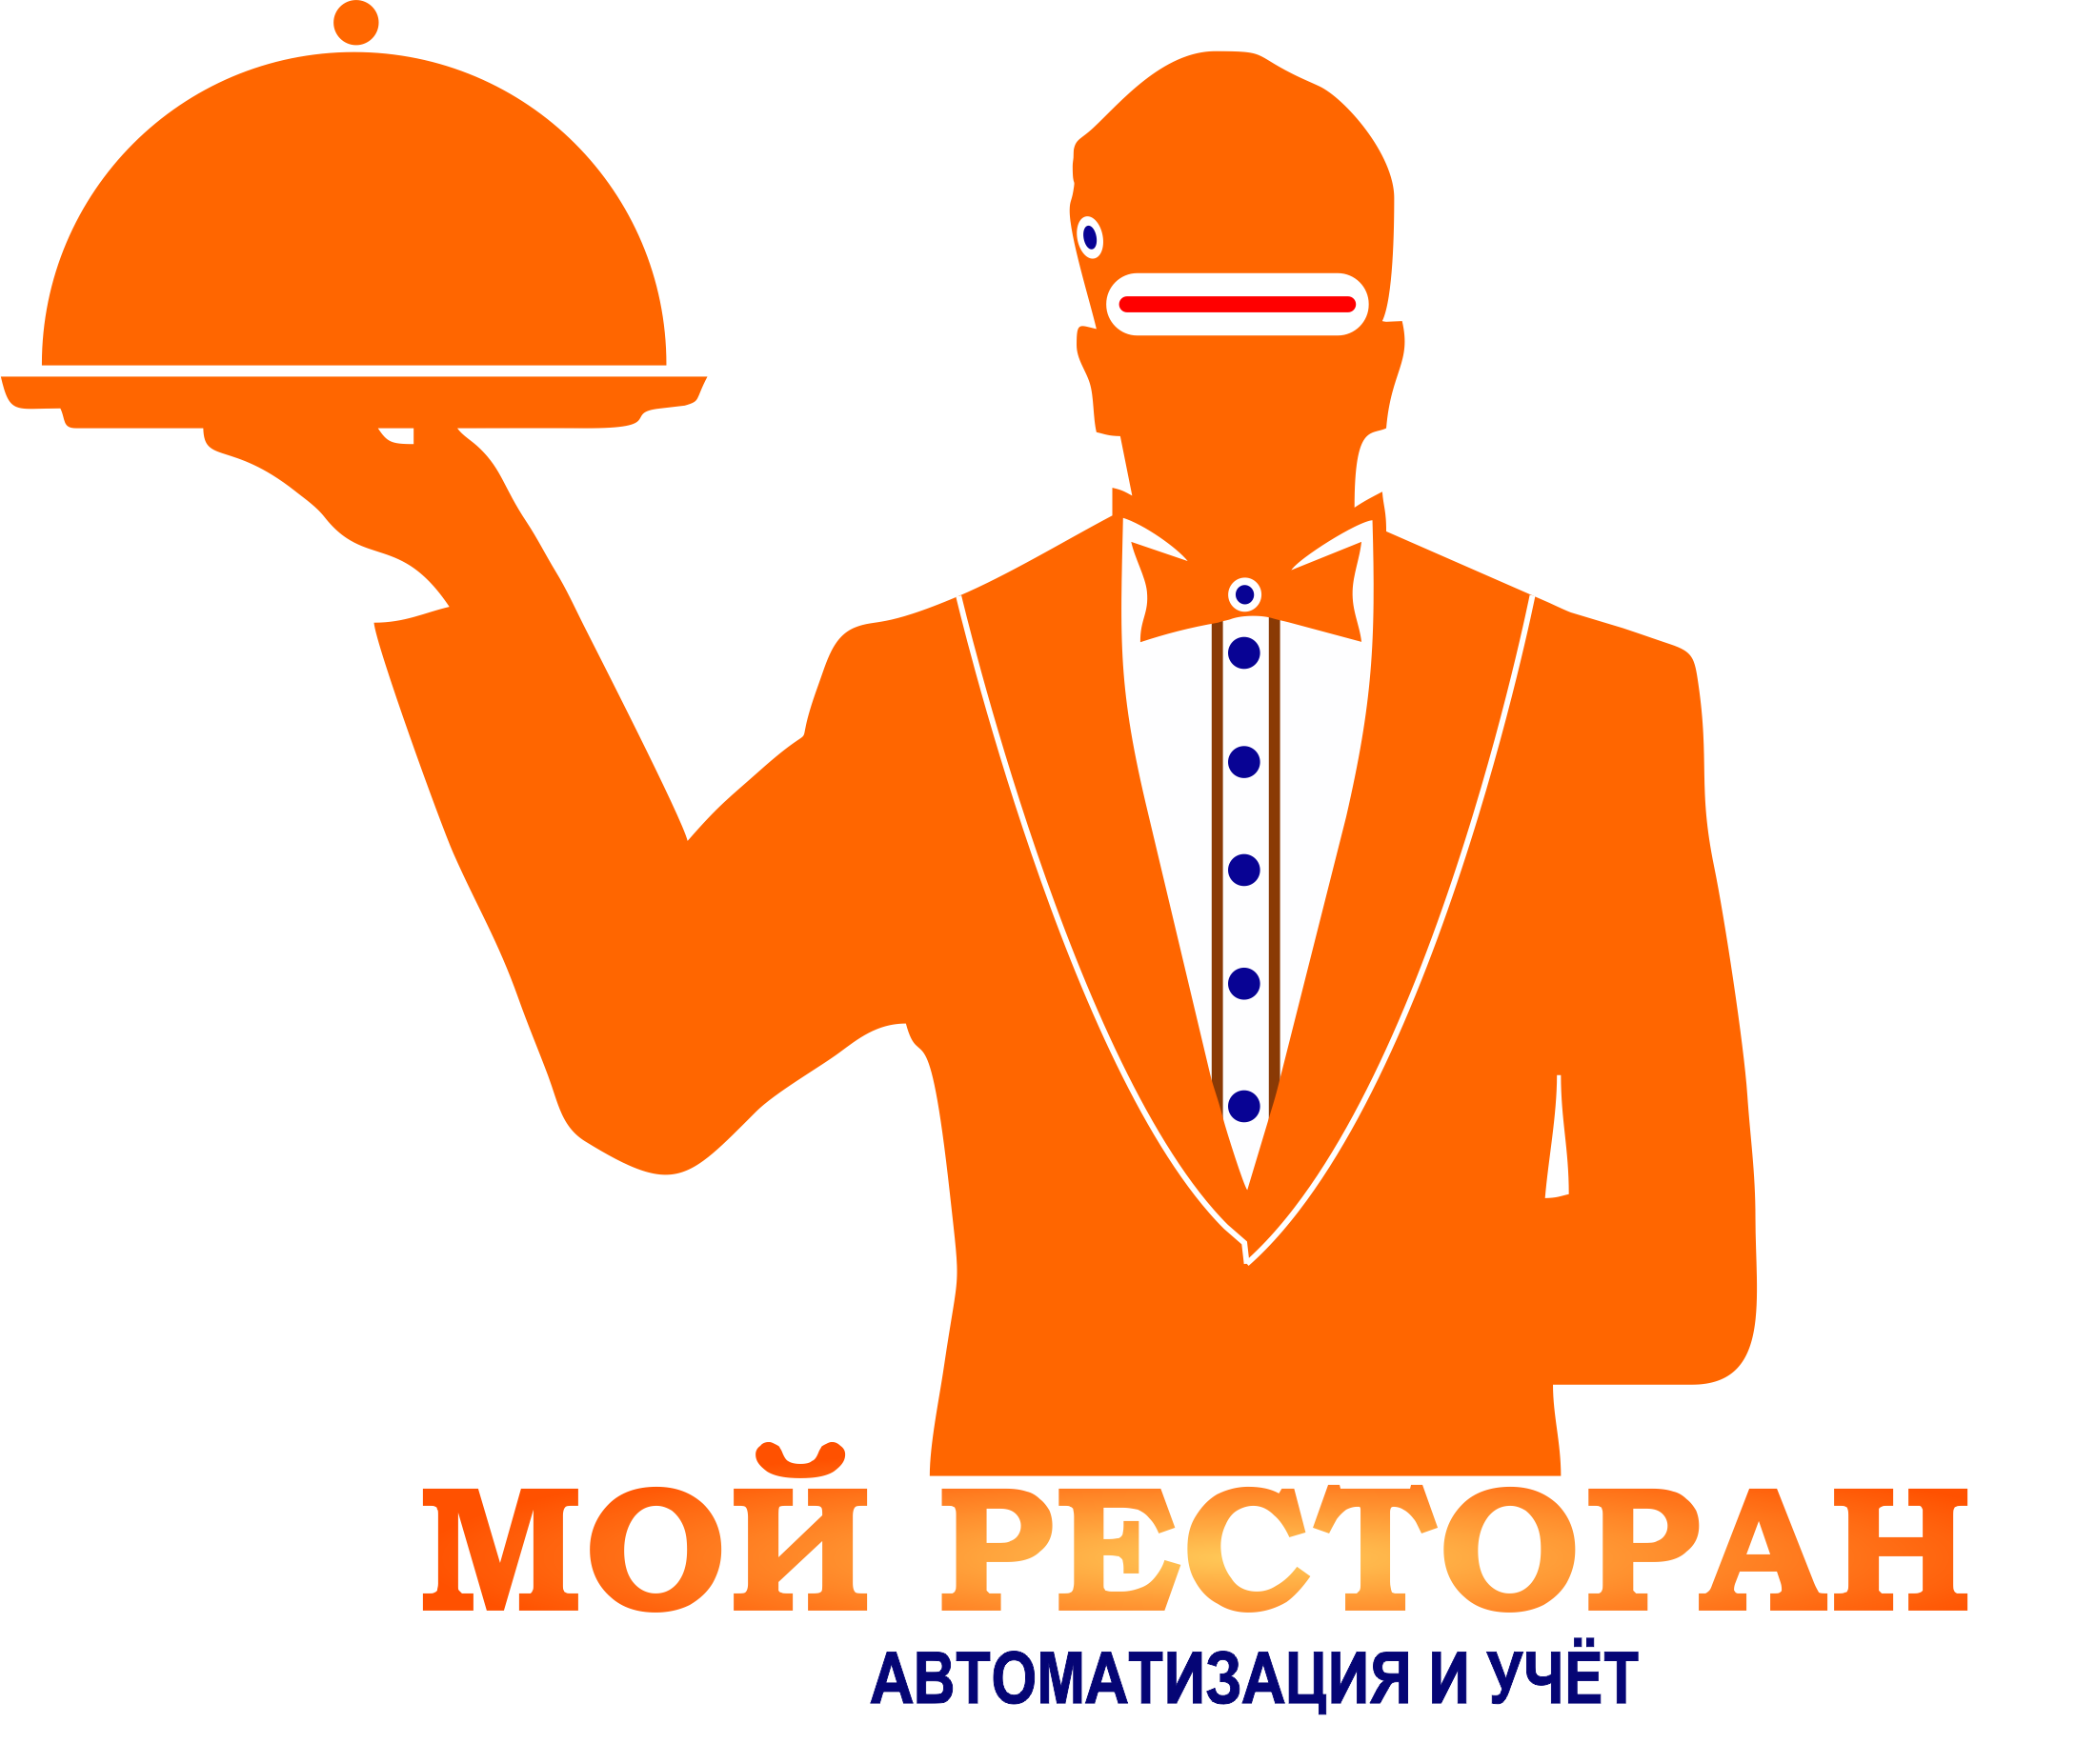 Разработать логотип и фавикон для IT- компании фото f_9365d5415c061fb5.png